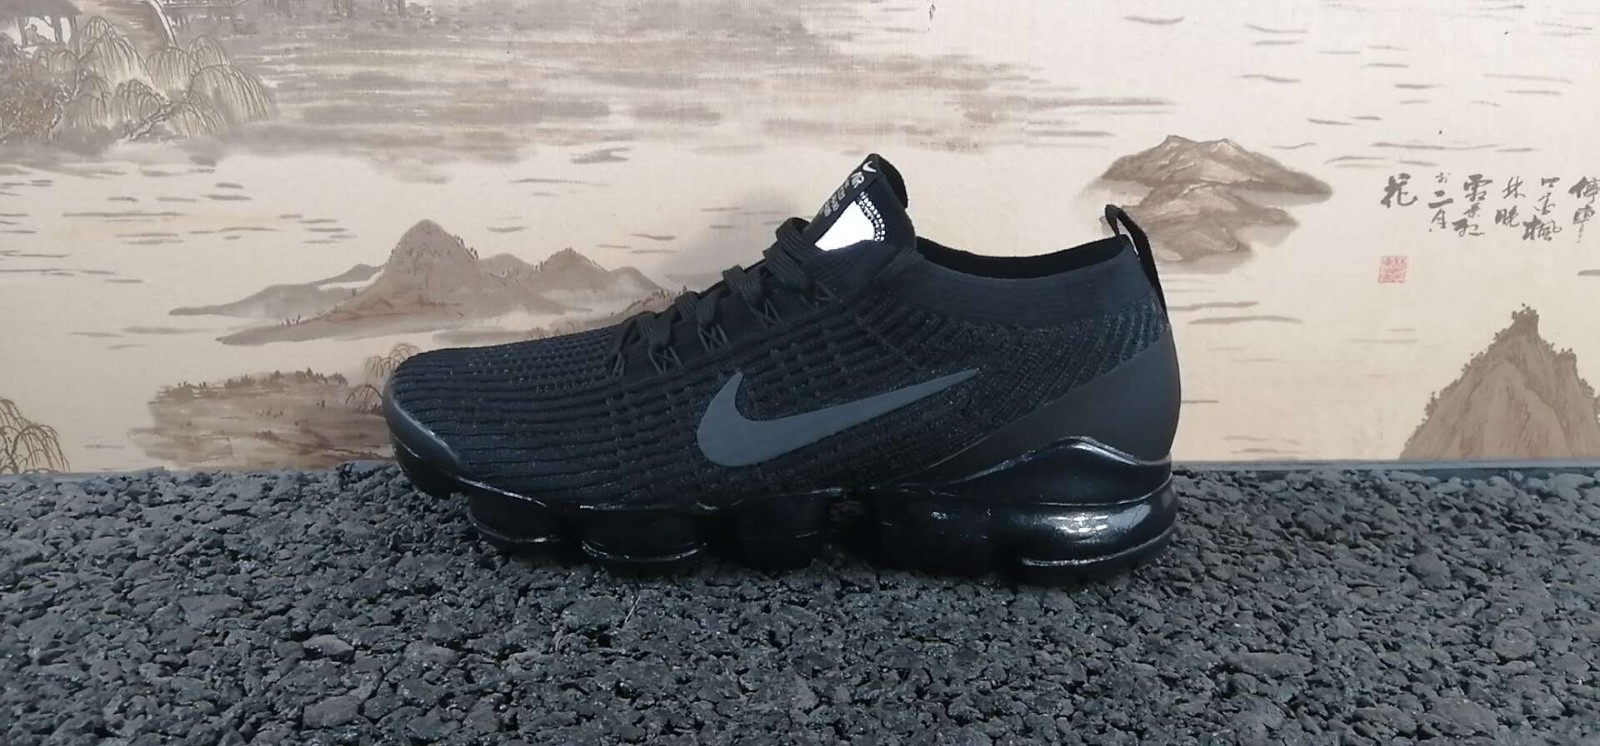 Nike Air Vapormax Flyknit 3 Black Grey Aj6900 002 Febbuy